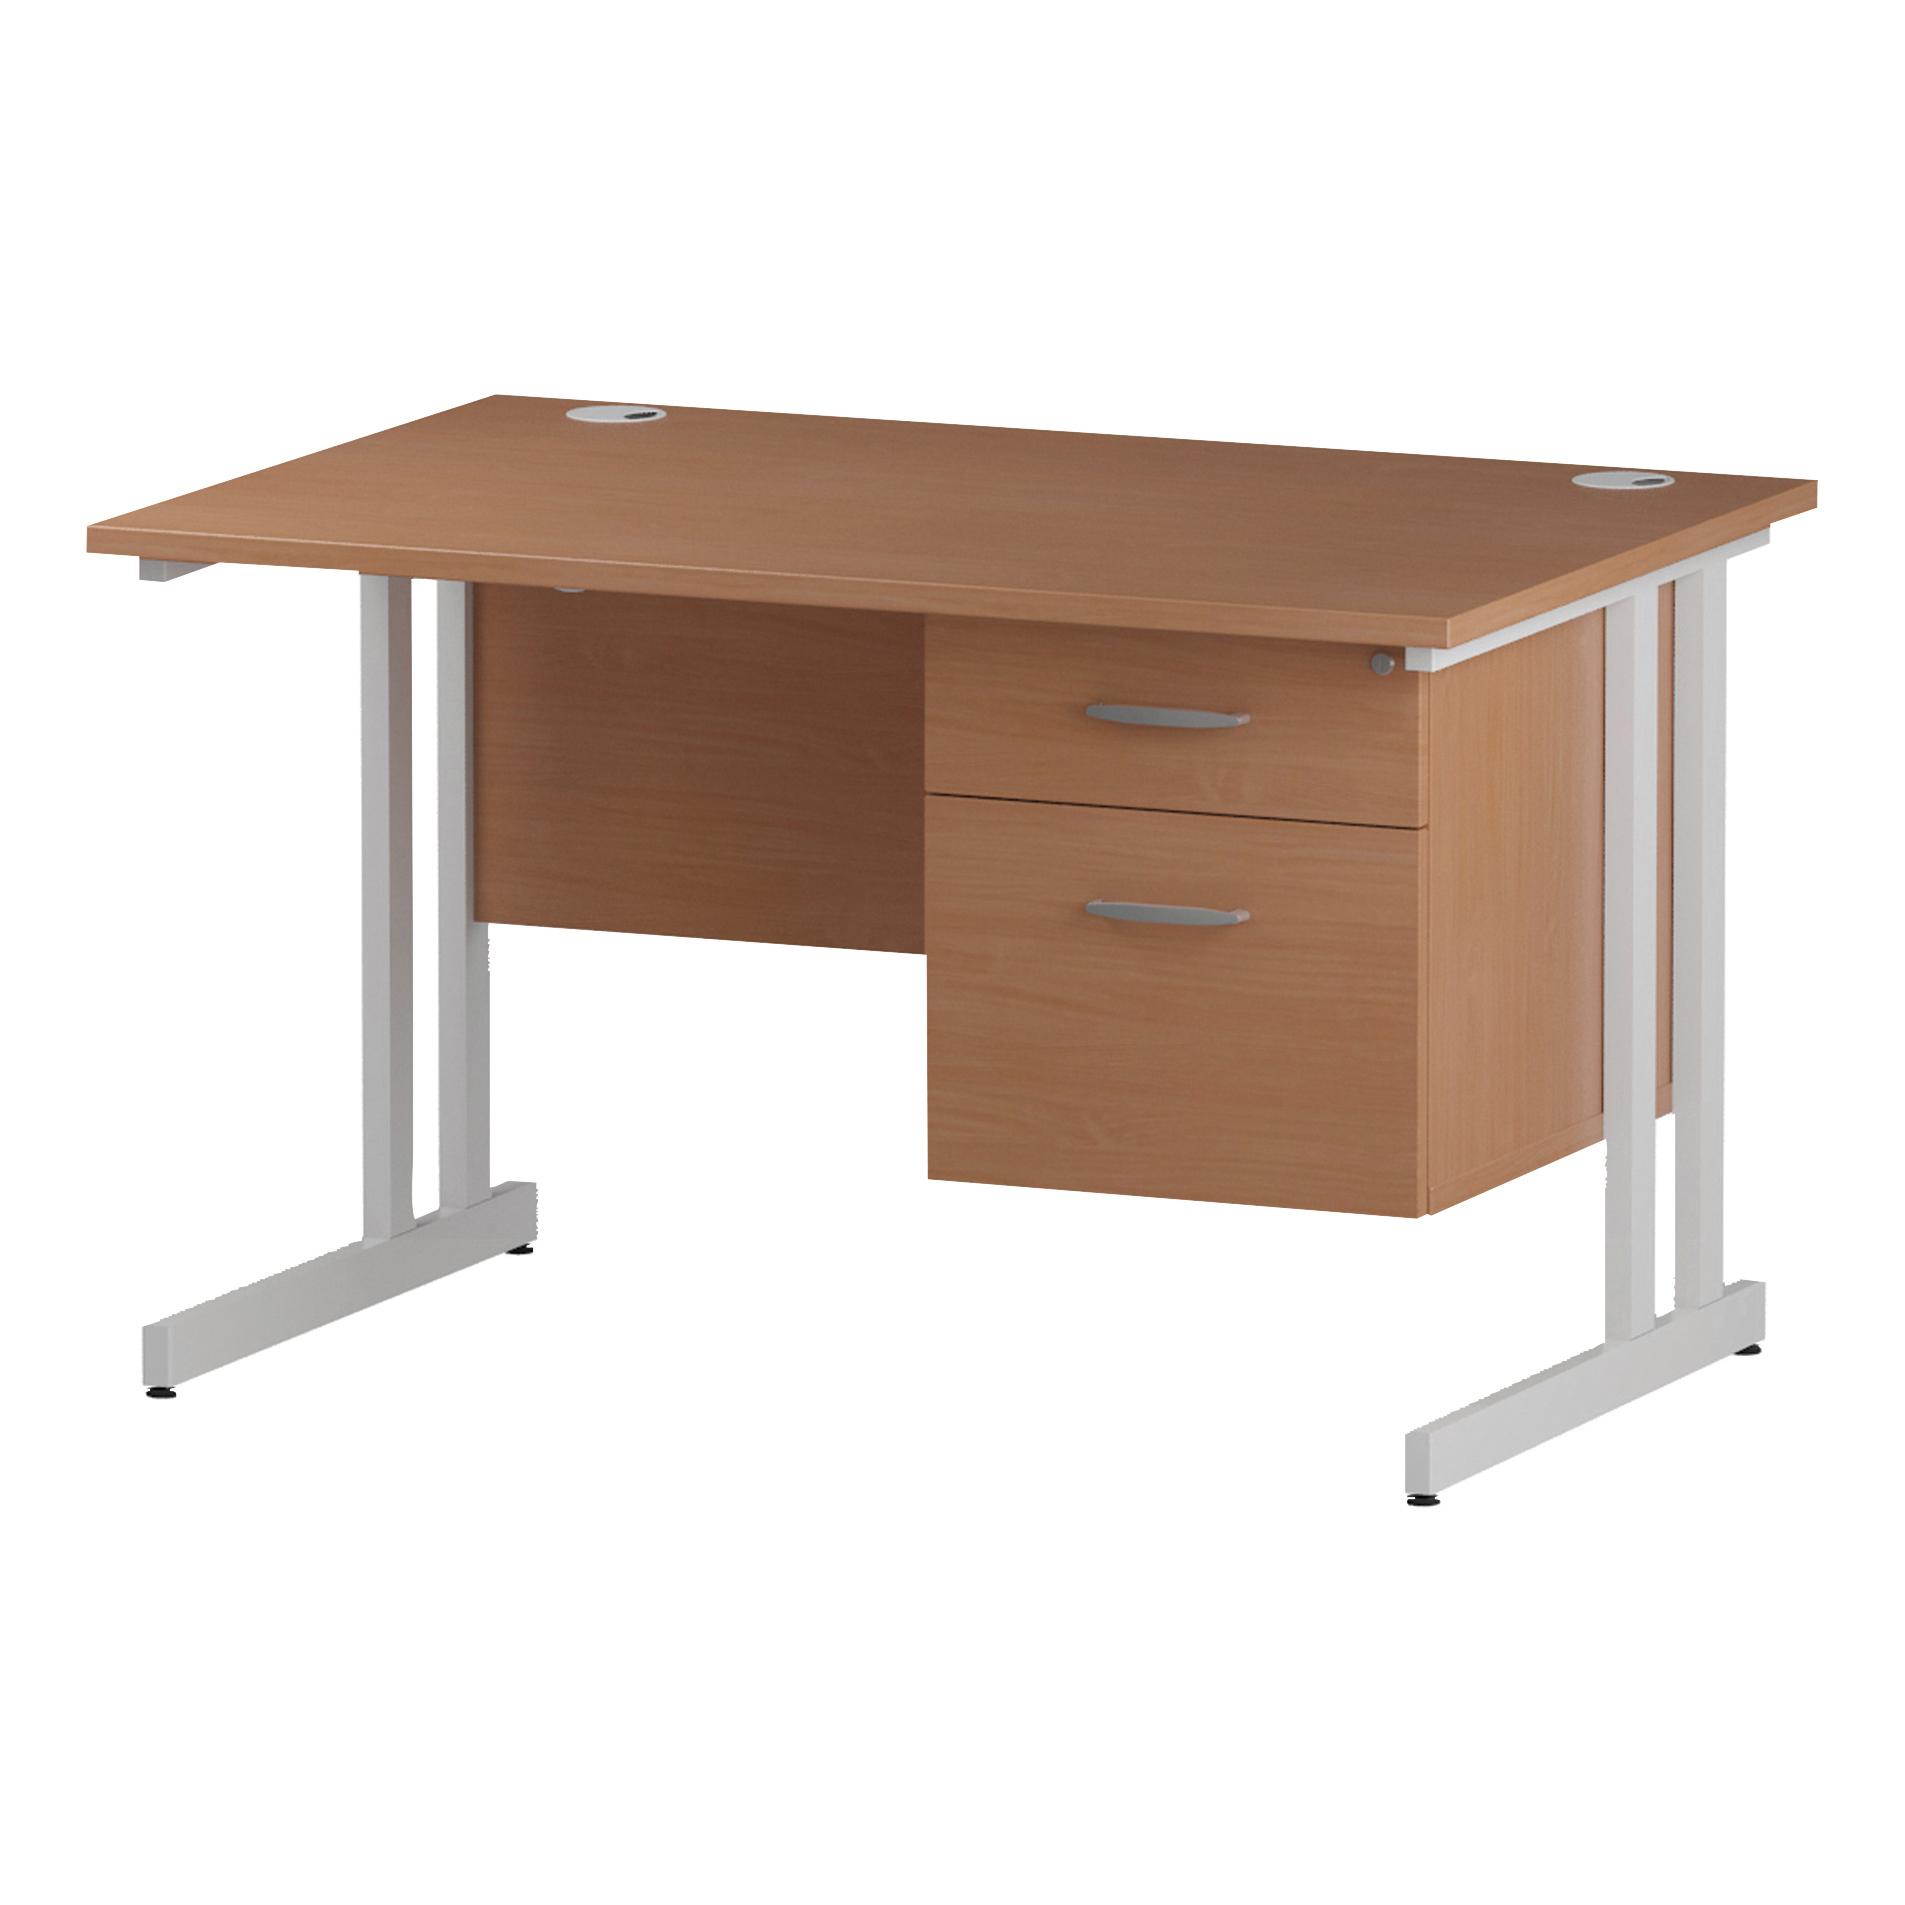 Trexus Rectangular Desk White Cantilever Leg 1200x800mm Fixed Pedestal 2 Drawers Beech Ref I001692